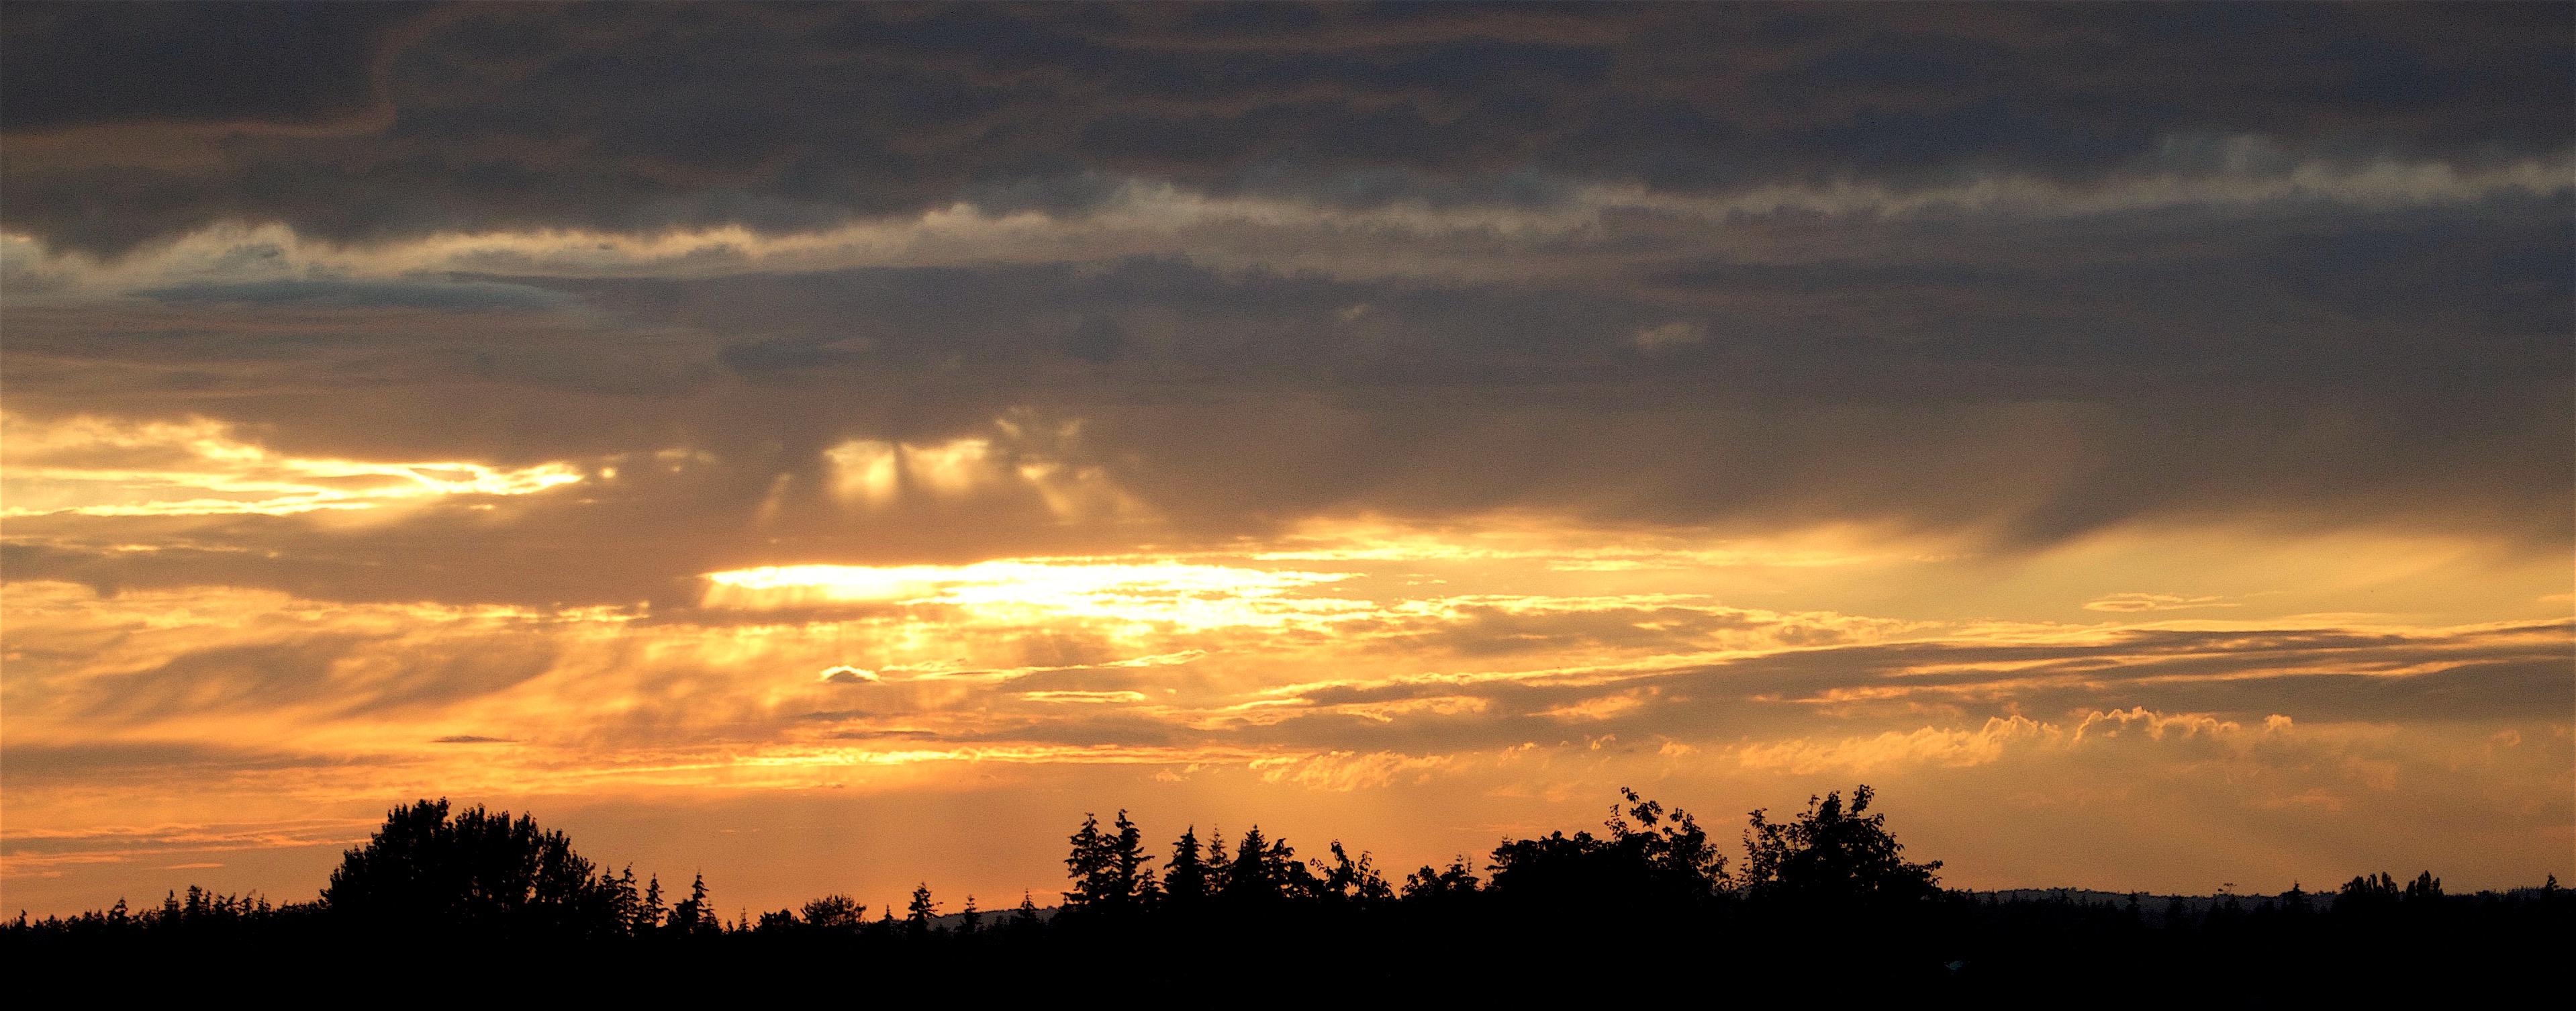 sunset69161